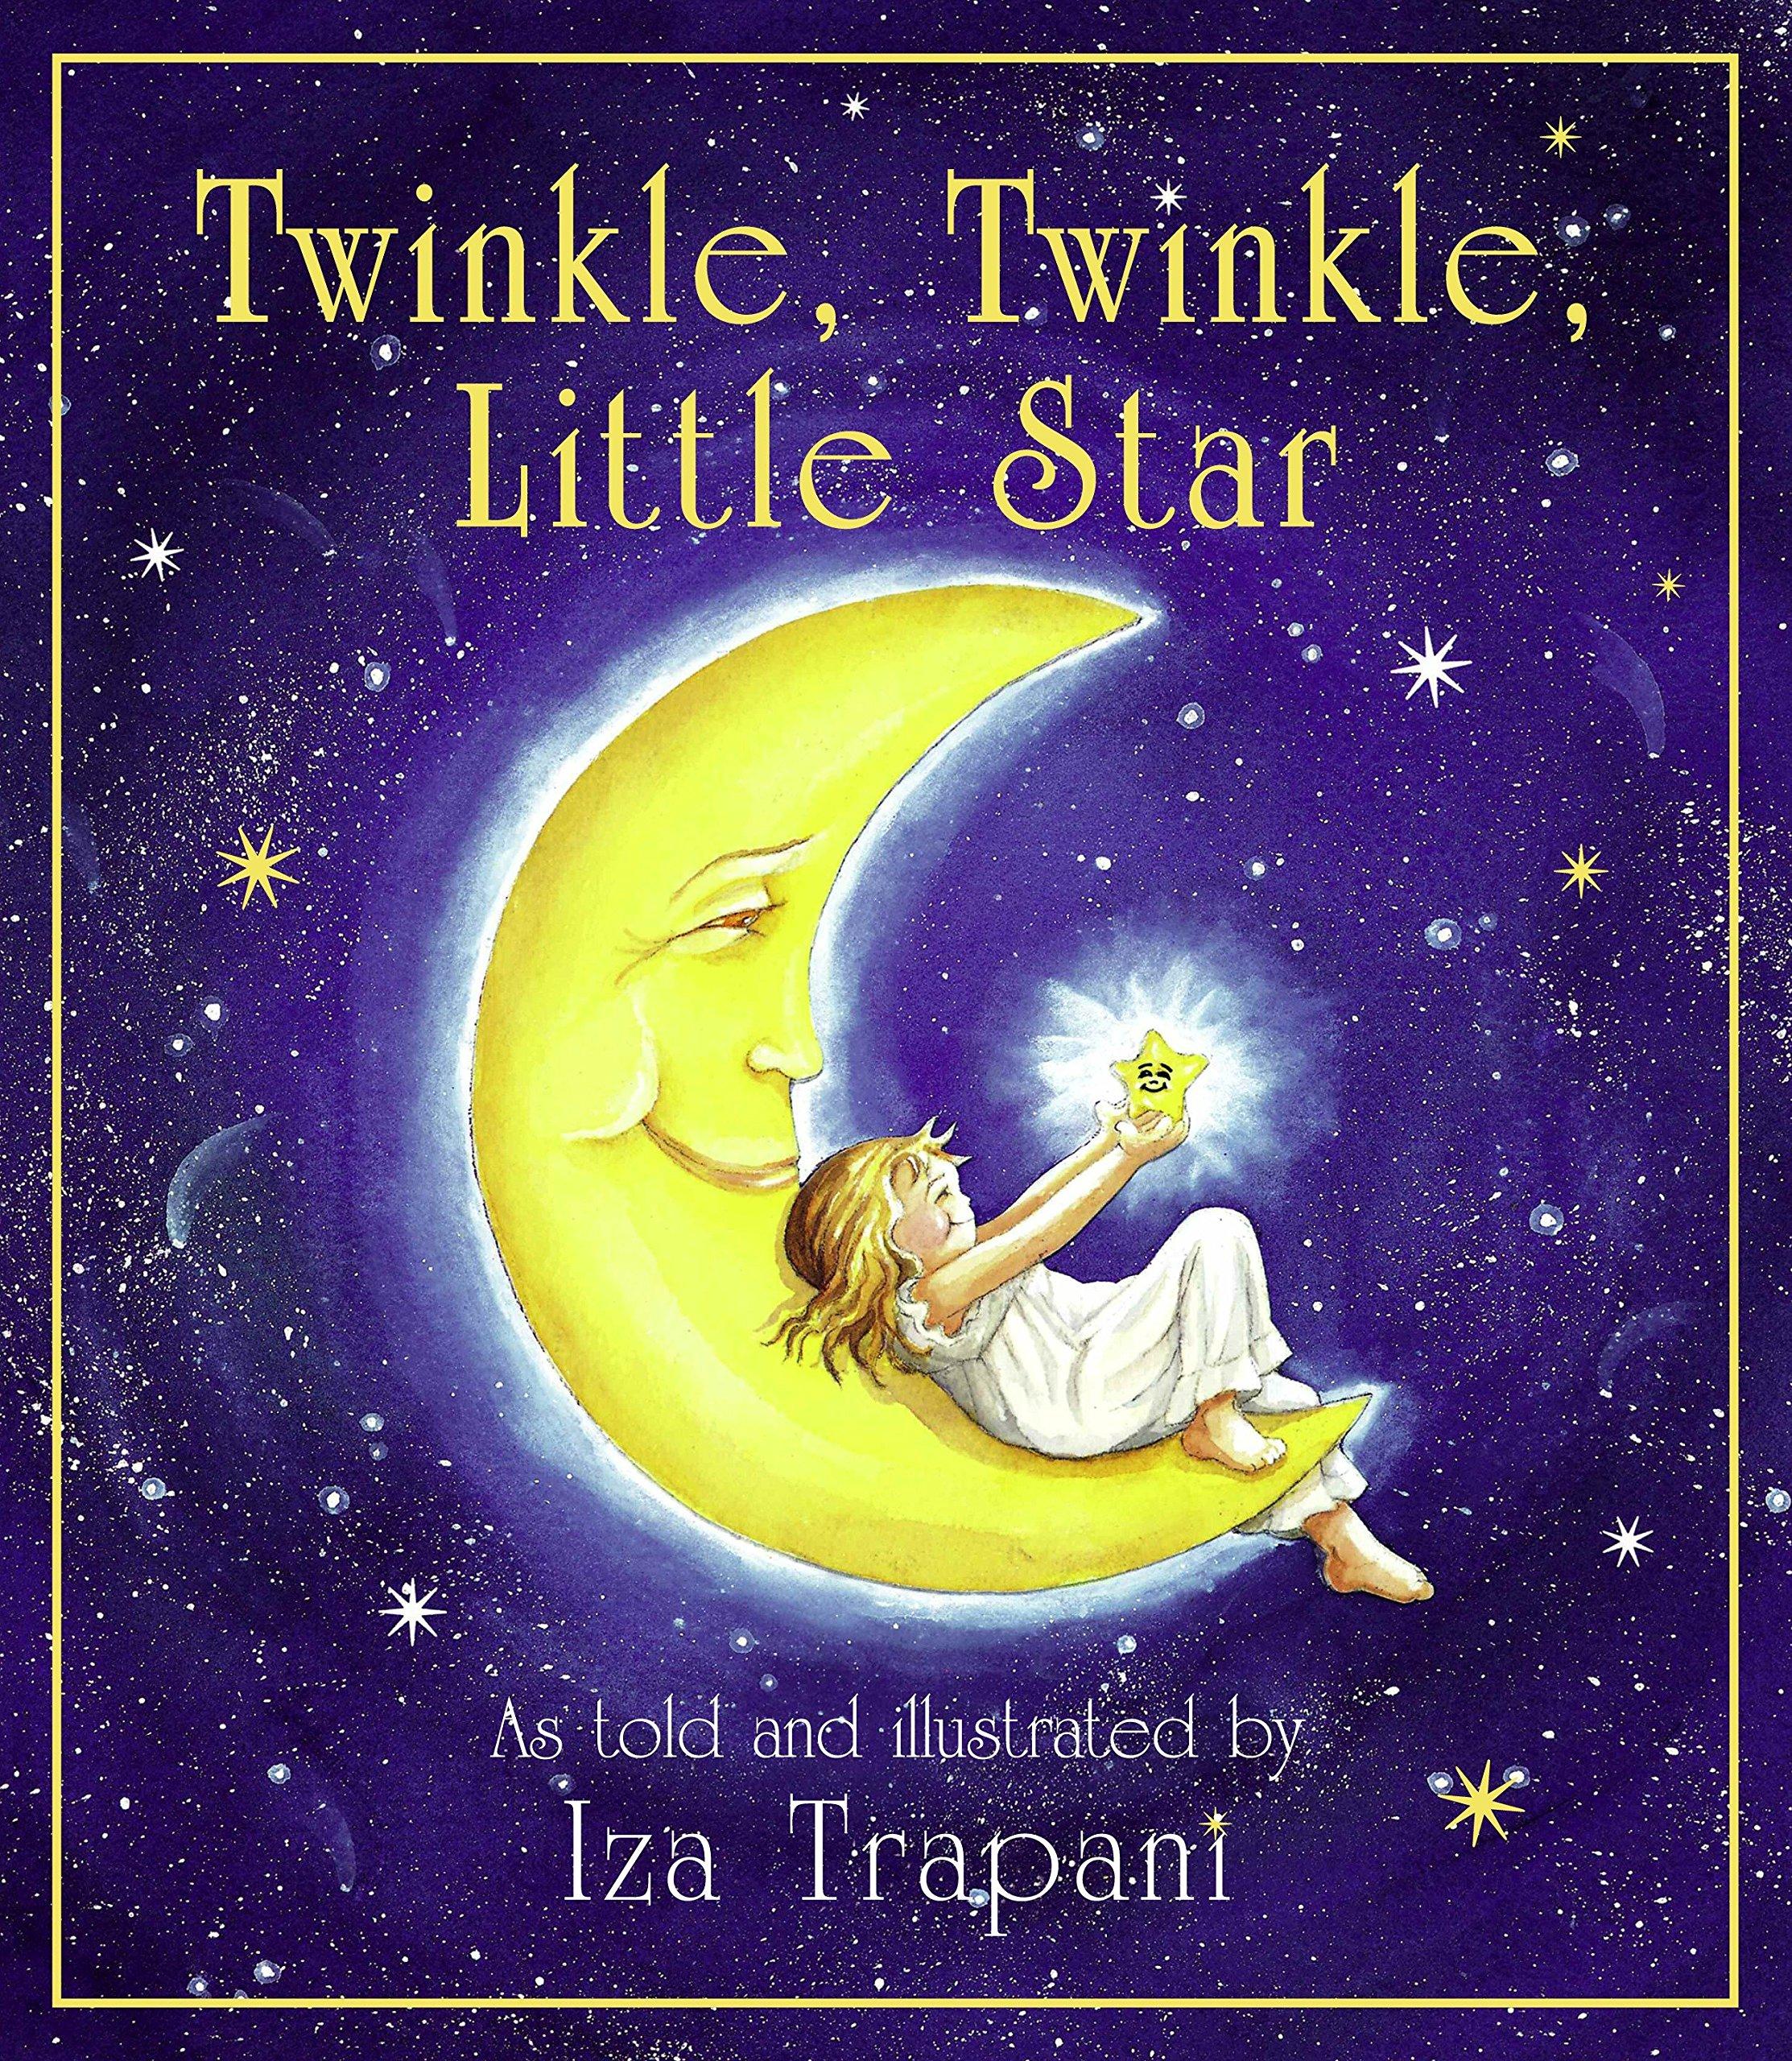 2bba3d1f6 Amazon.com: Twinkle, Twinkle, Little Star (Iza Trapani's Extended Nursery  Rhymes) (9781879085701): Iza Trapani: Books